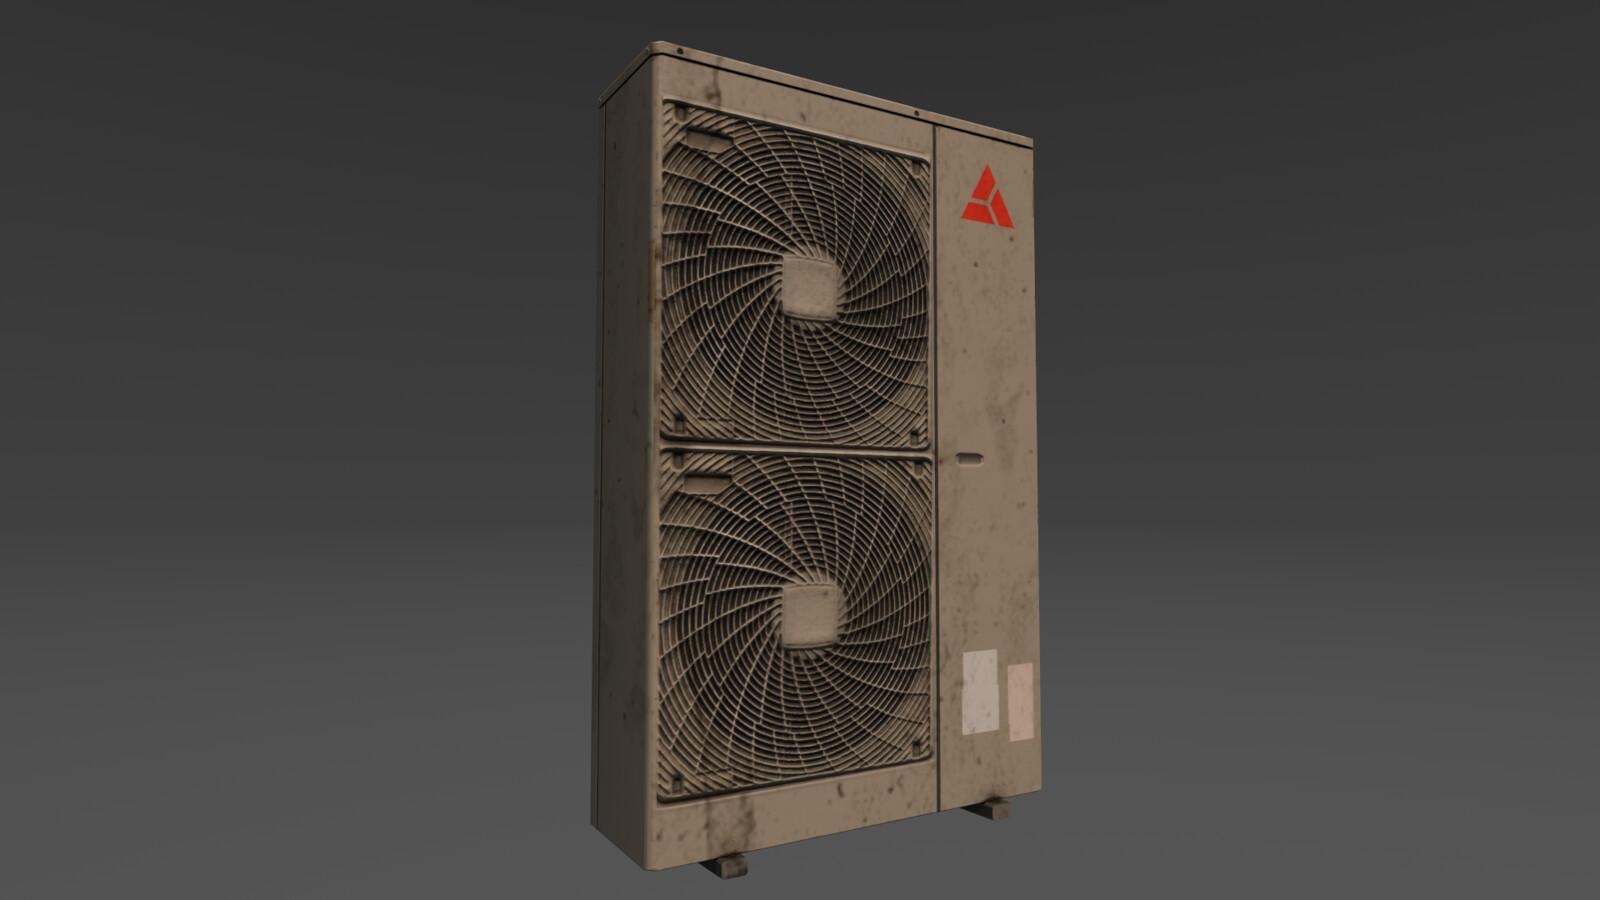 Model 3 - big air conditioner